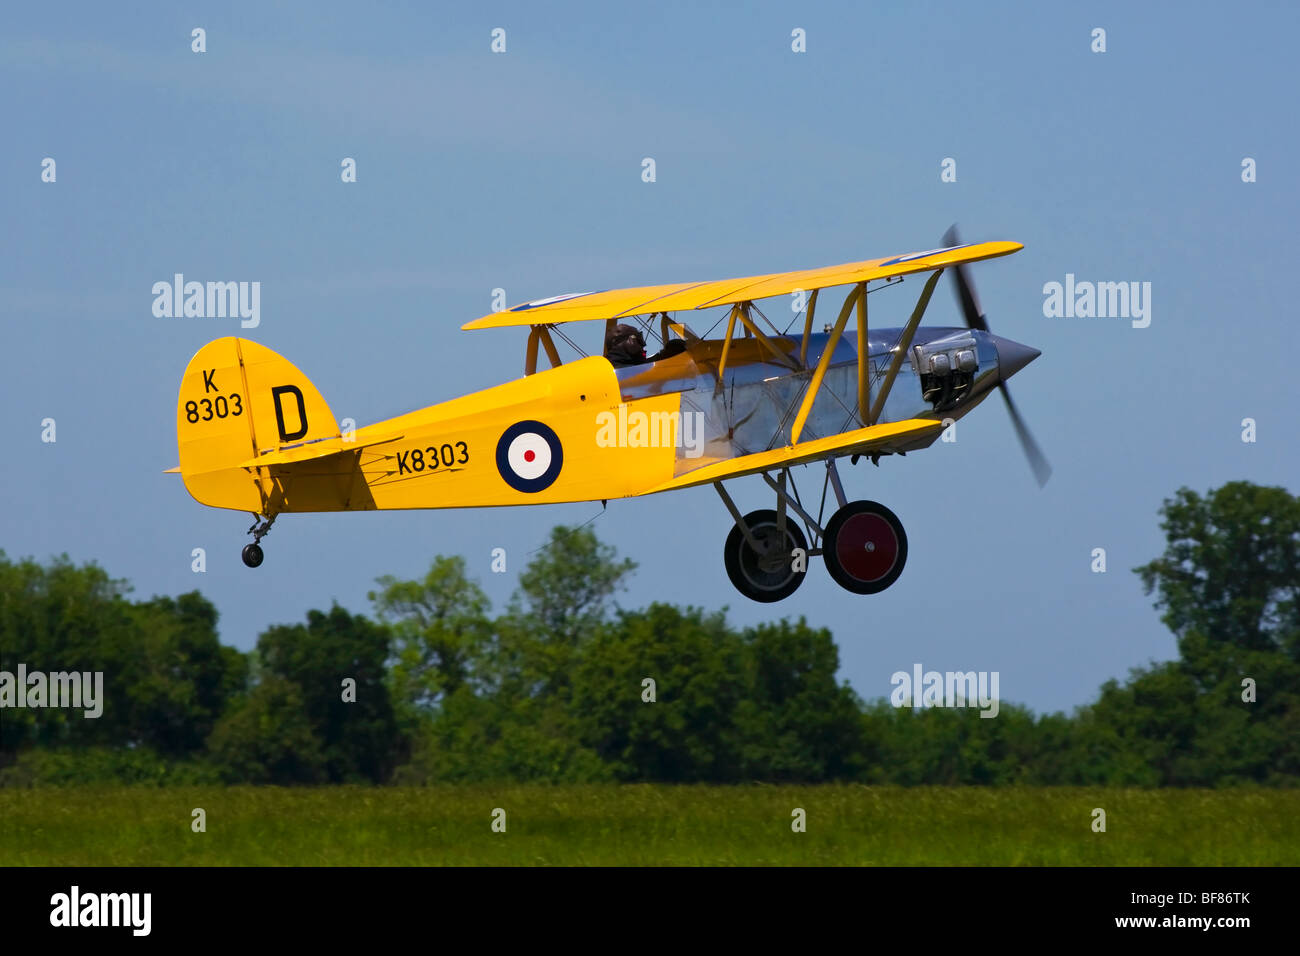 An Isaacs Fury biplane on take off - Stock Image